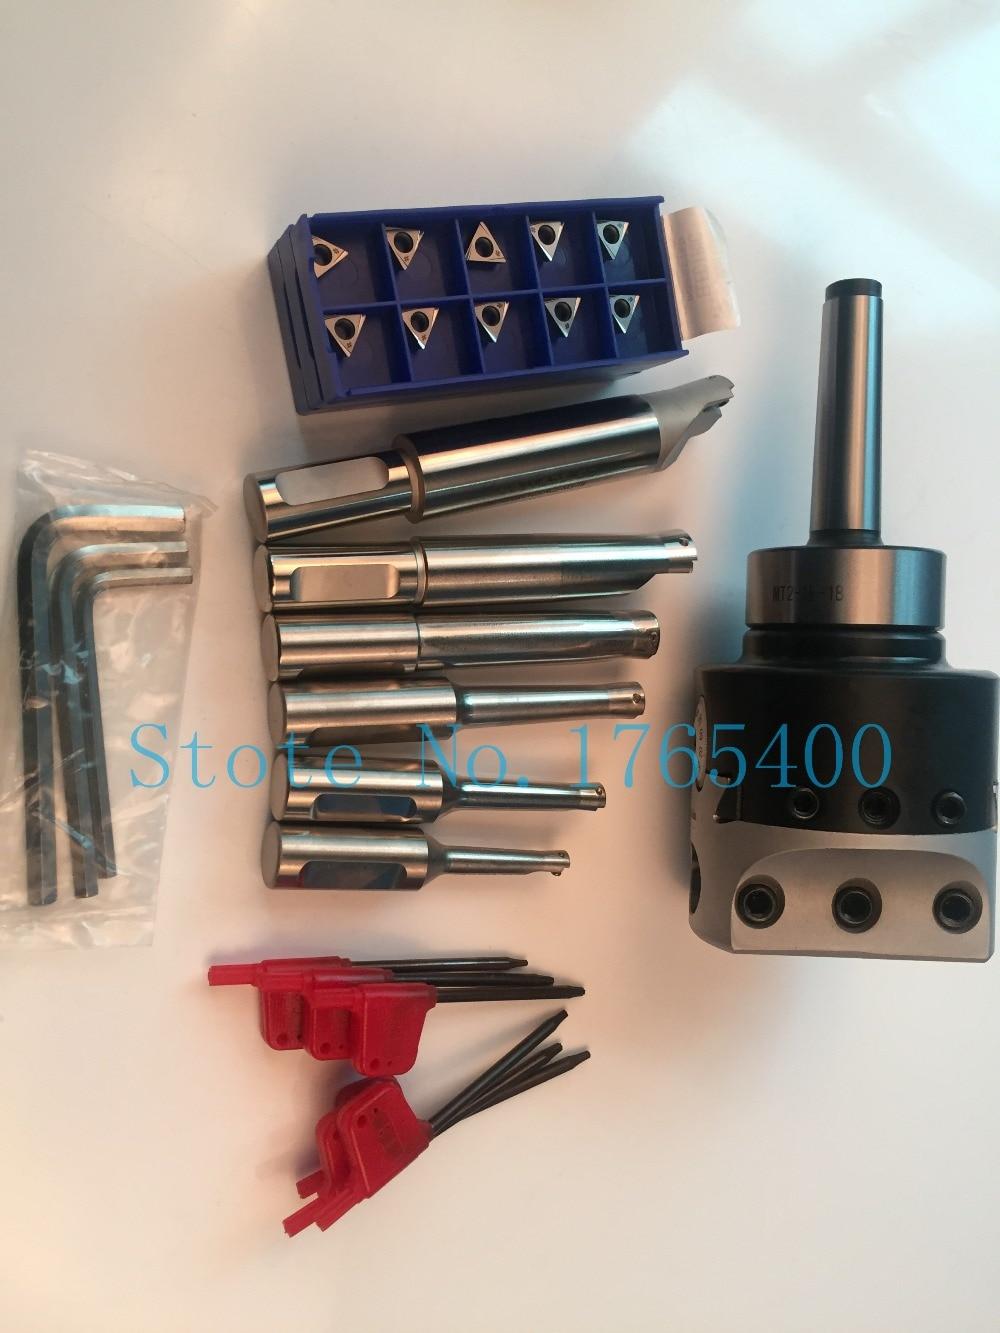 New MT2 M10 & F1 -18 75mm boring head and shank 18mm 6pcs boring bar and 10pcs carbide inserts цена